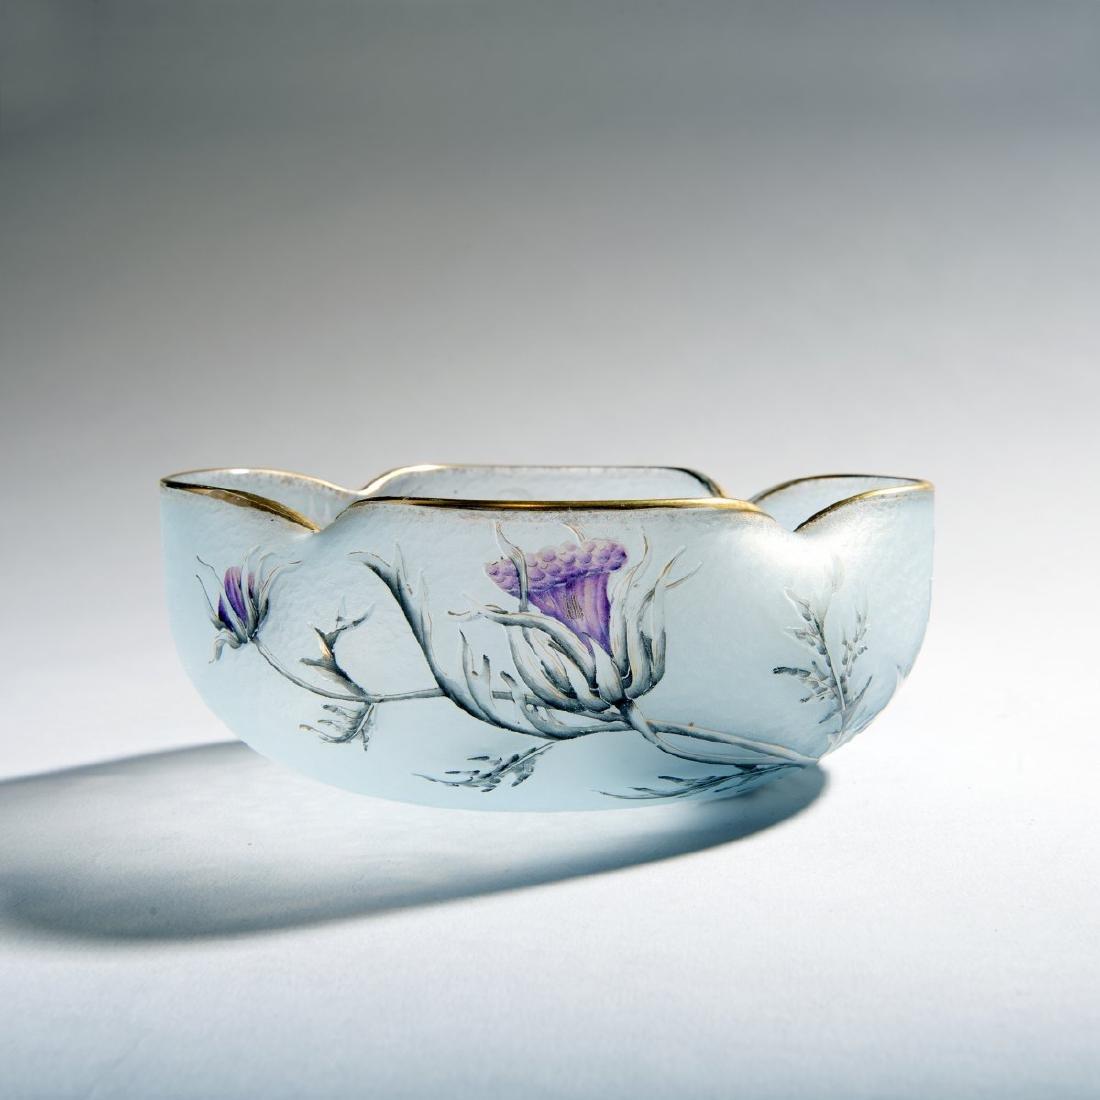 Daum Freres, 'Chardons en Fleurs', bowl, c. 1900